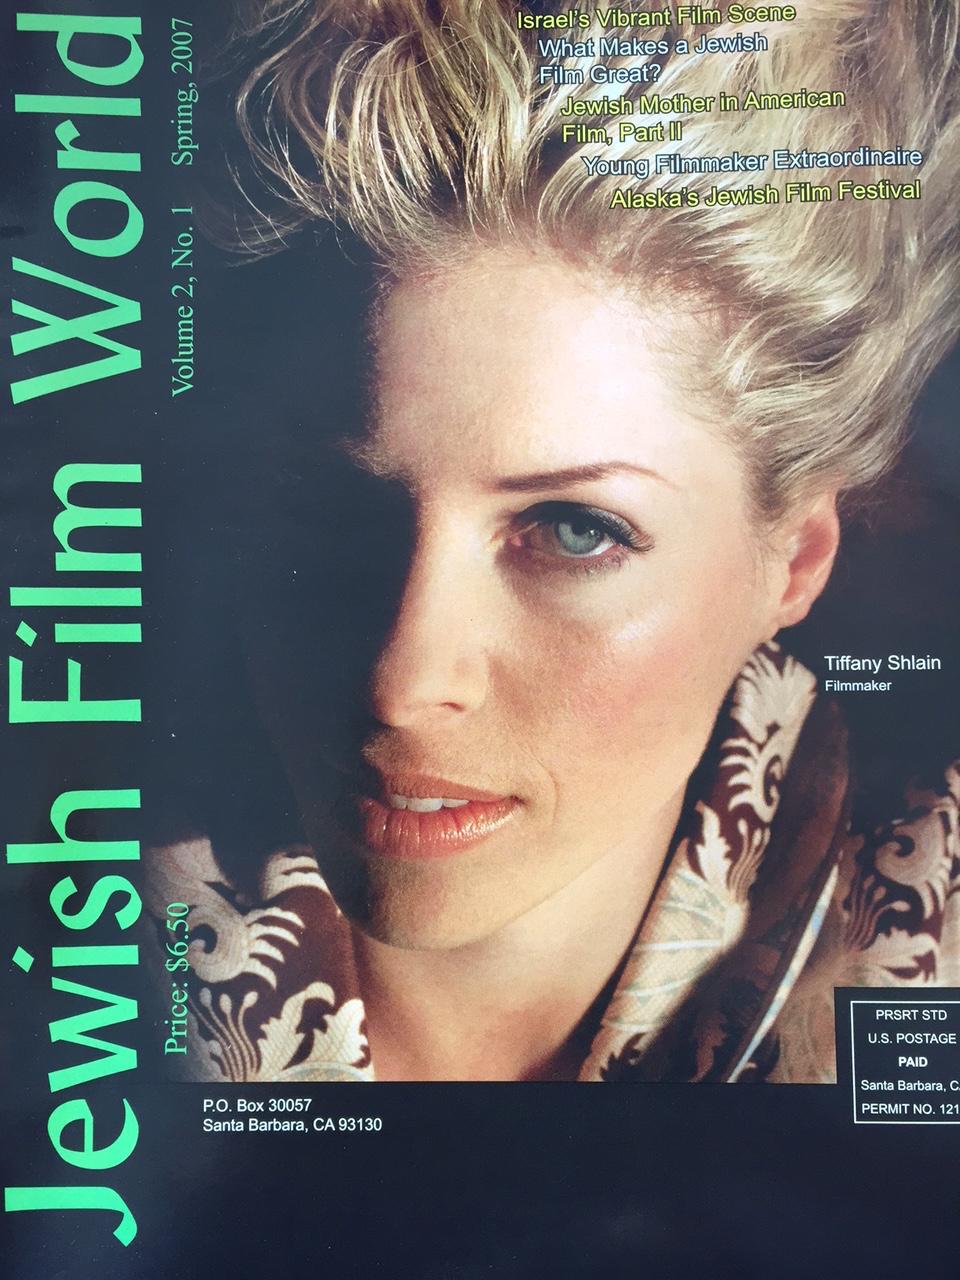 Jewish_Film_World.JPG